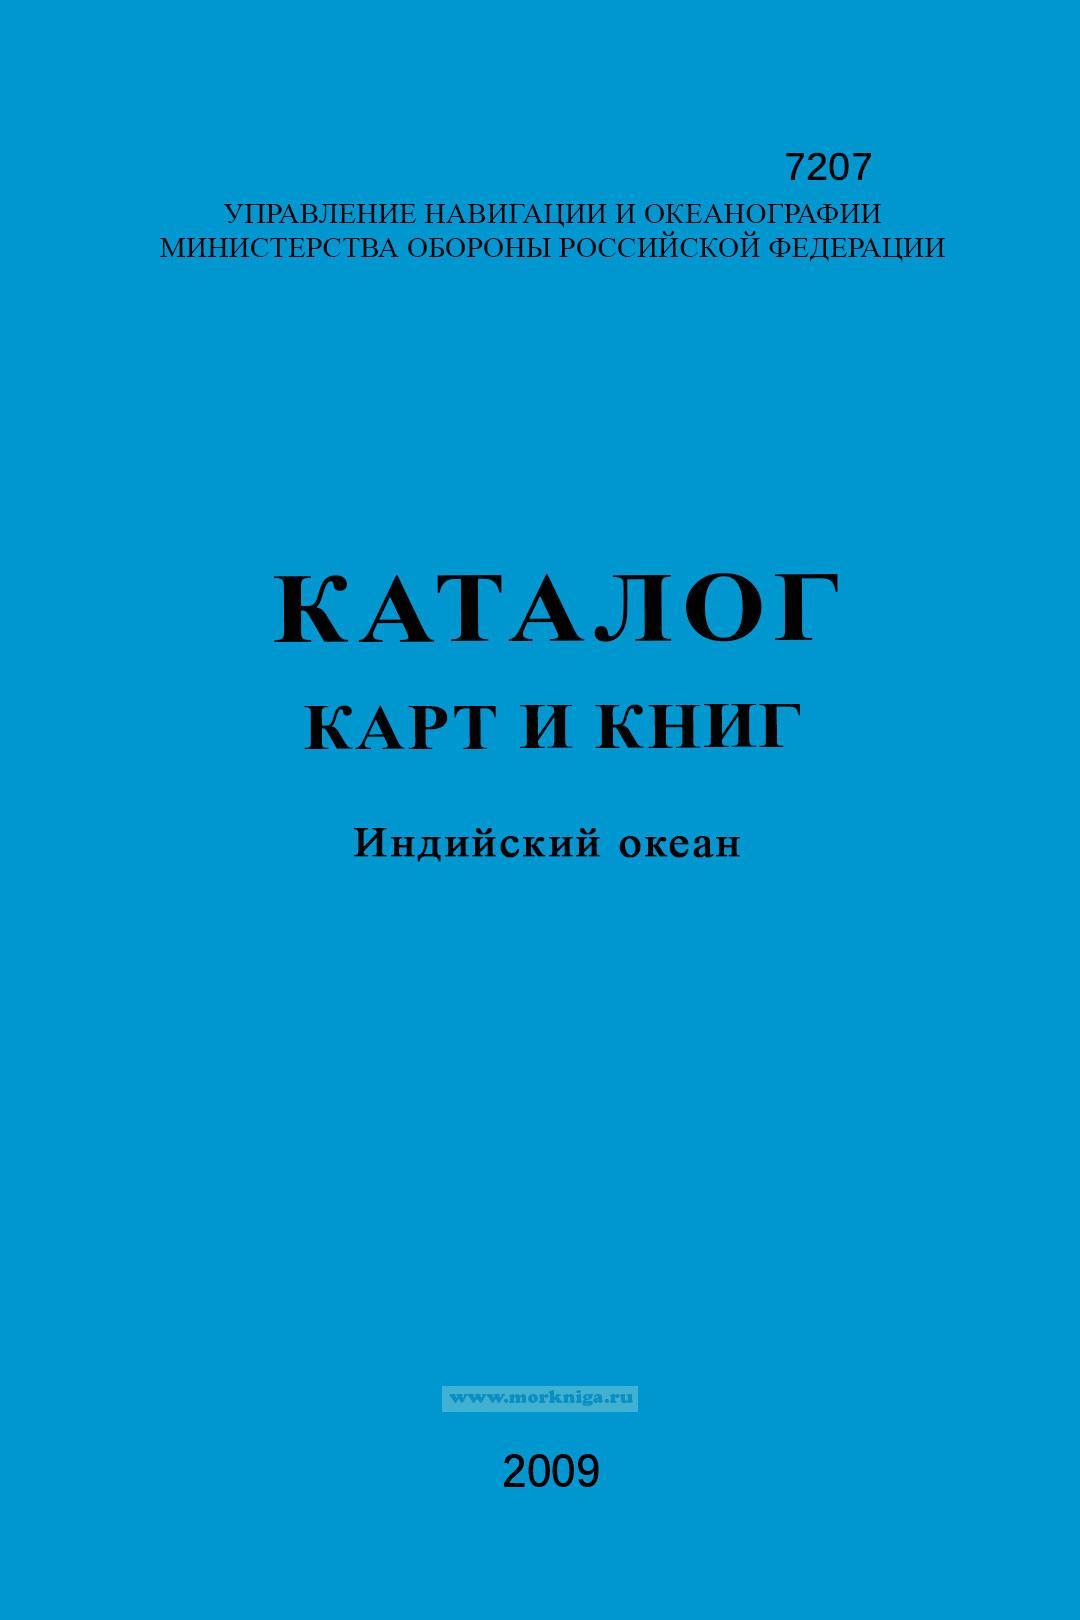 Каталог карт и книг ГУНиО РФ. Индийский океан. № 7307